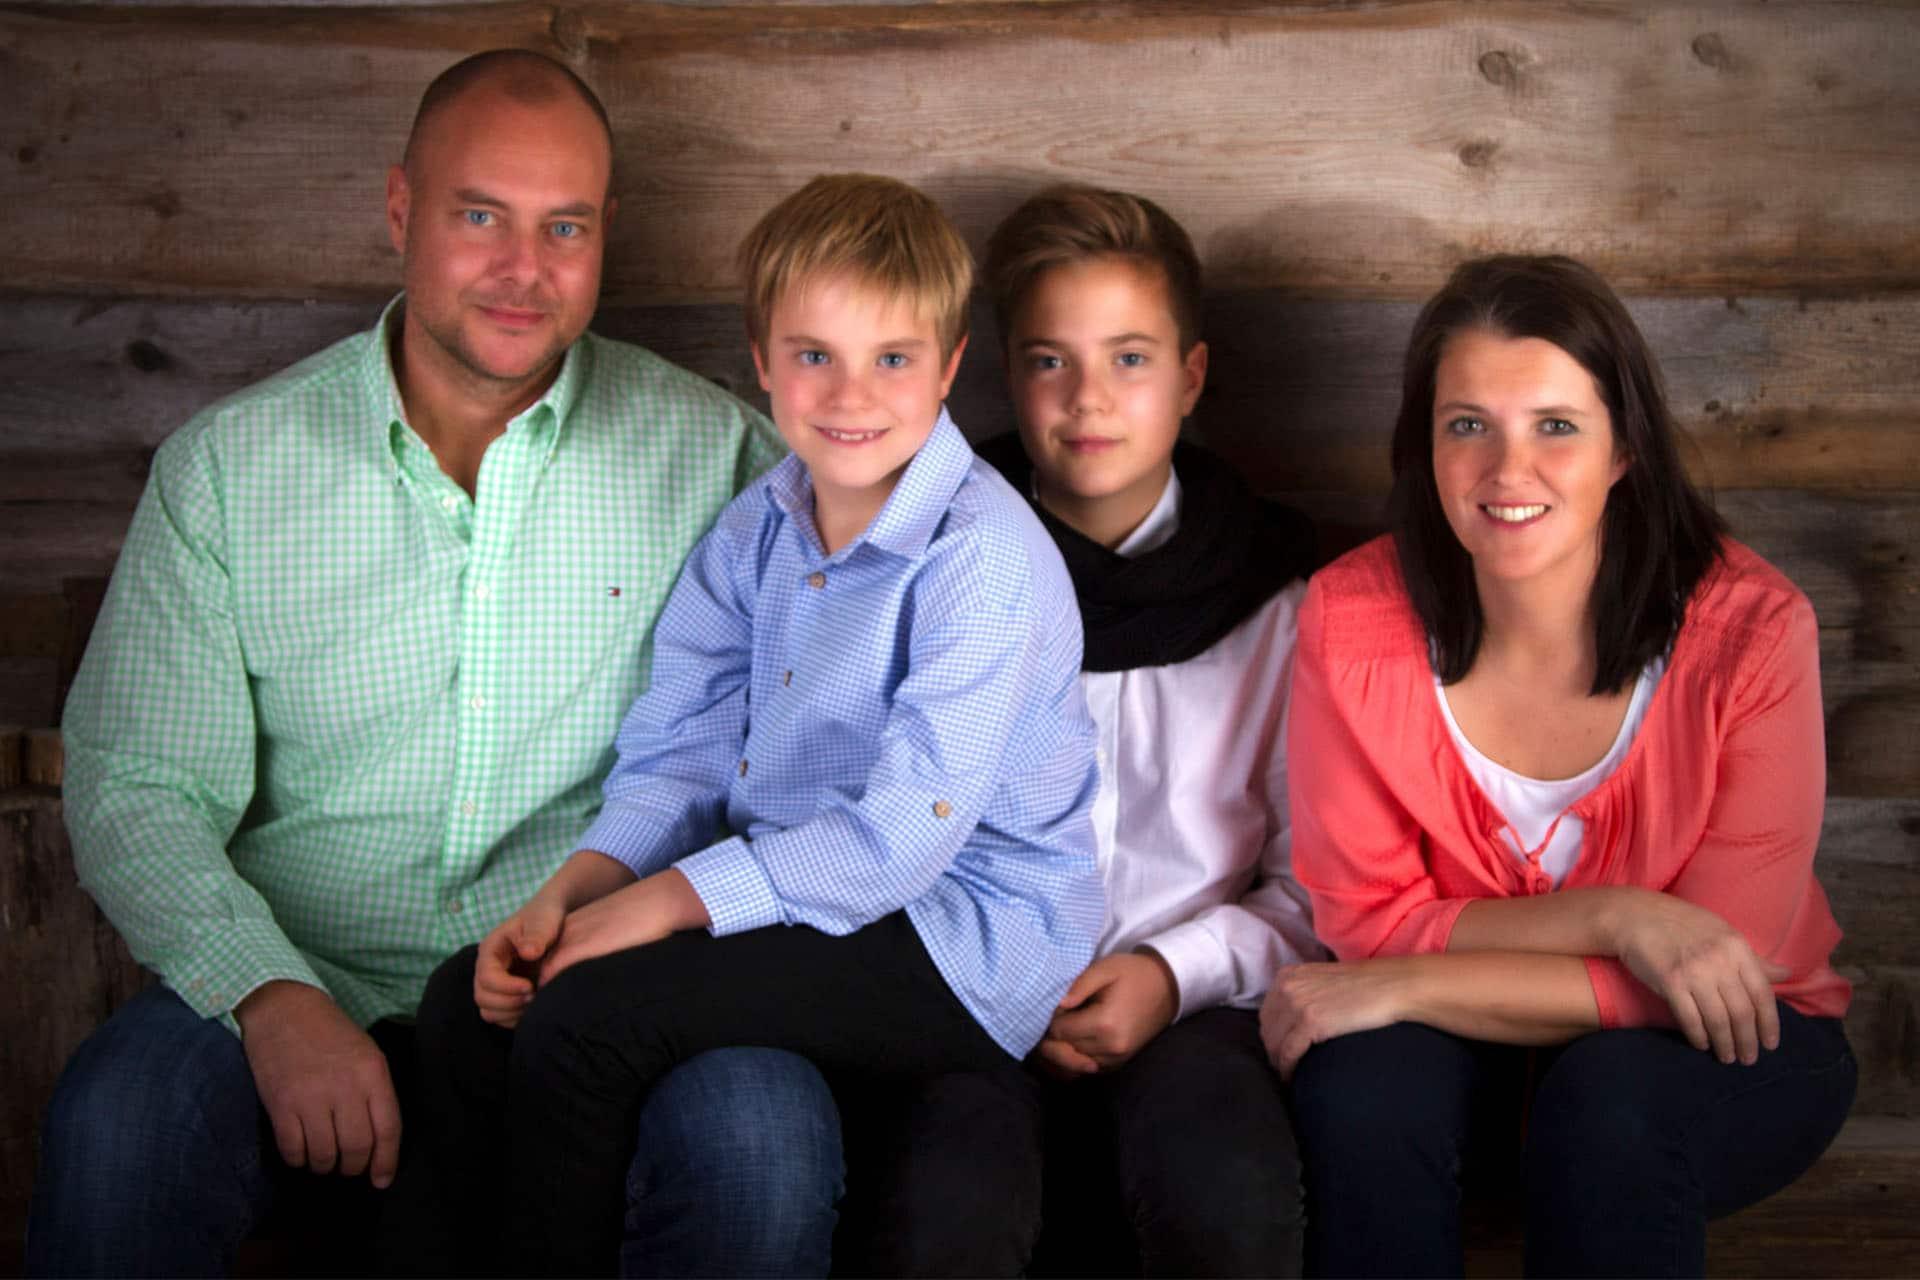 Familienfotos - Geschenk - Familienfotografie - Familienfotograf - Familienshooting Murnau - Foto Stoes